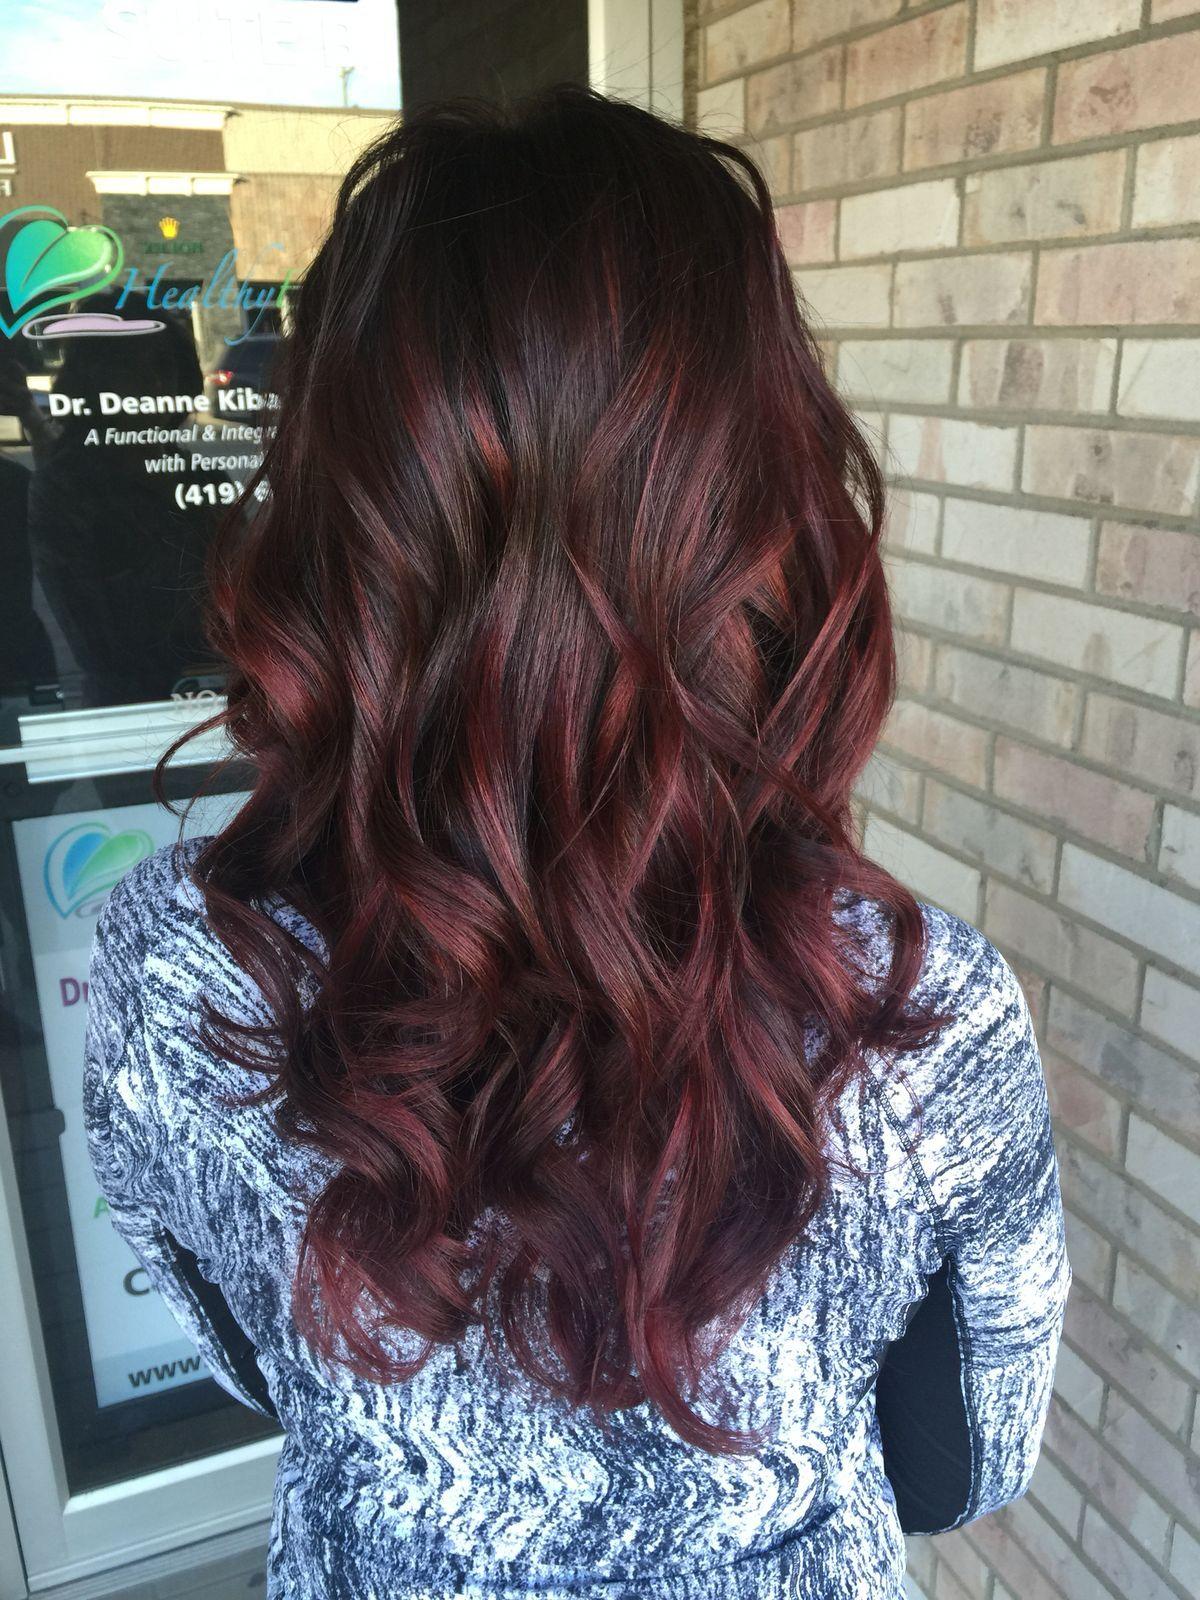 Pin by Megan Nennig on Hair Pinterest